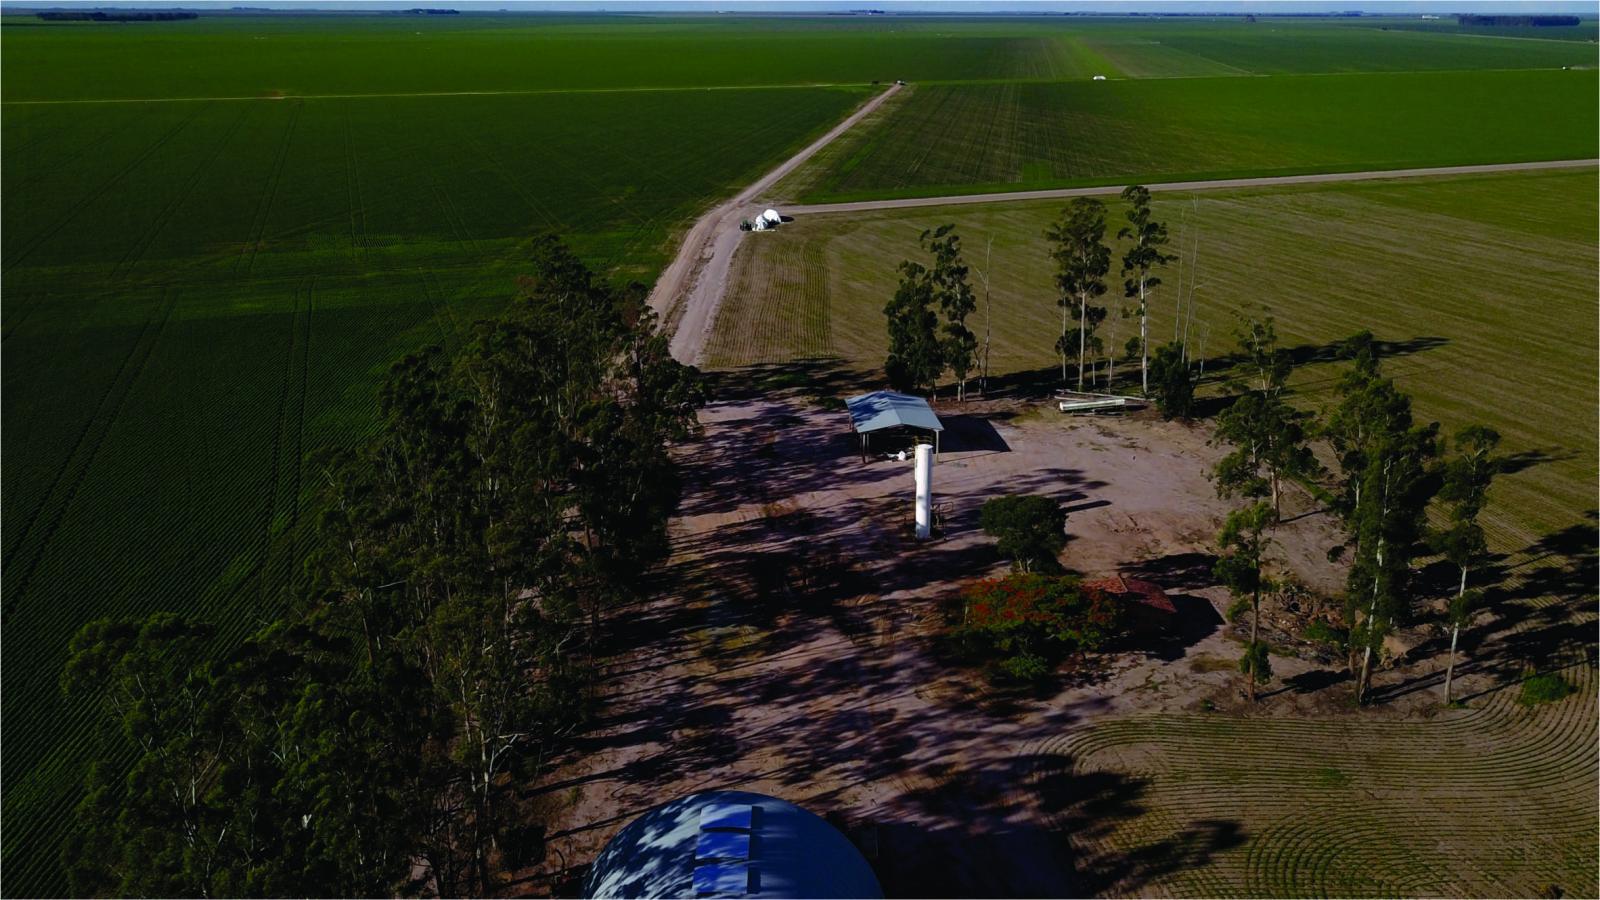 images/2018/04/carroll-farms-farmstead-45-gb1-1523485278mtuymzq4nti3oa.jpg